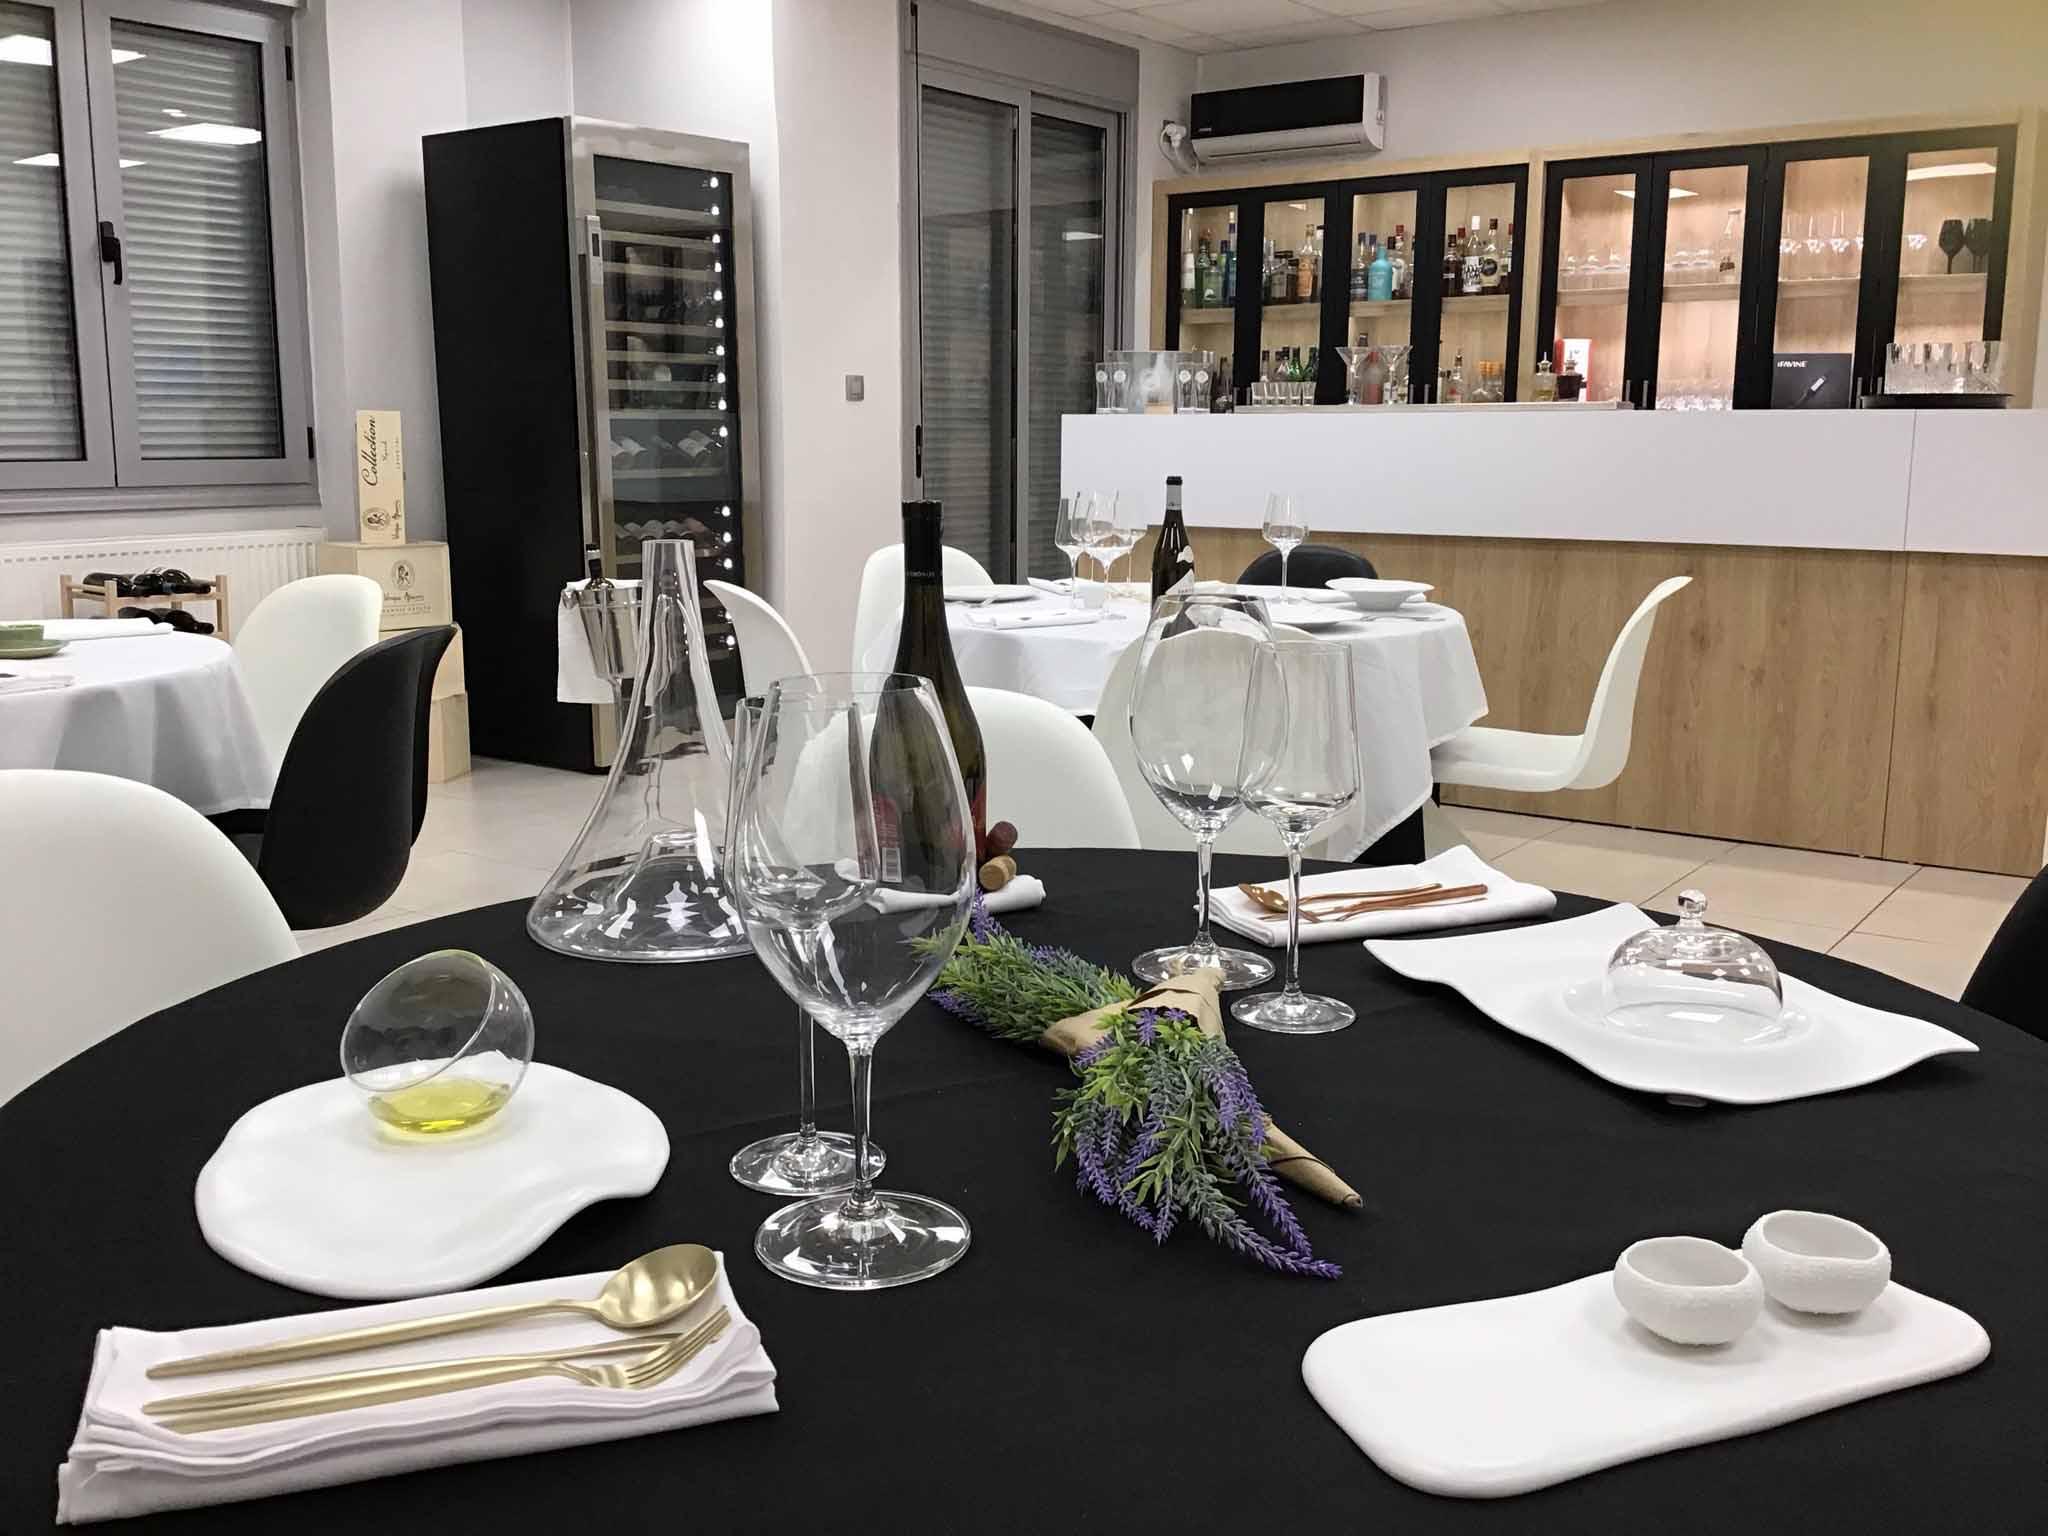 Bartending – Coctails' Bar – Restaurant Service